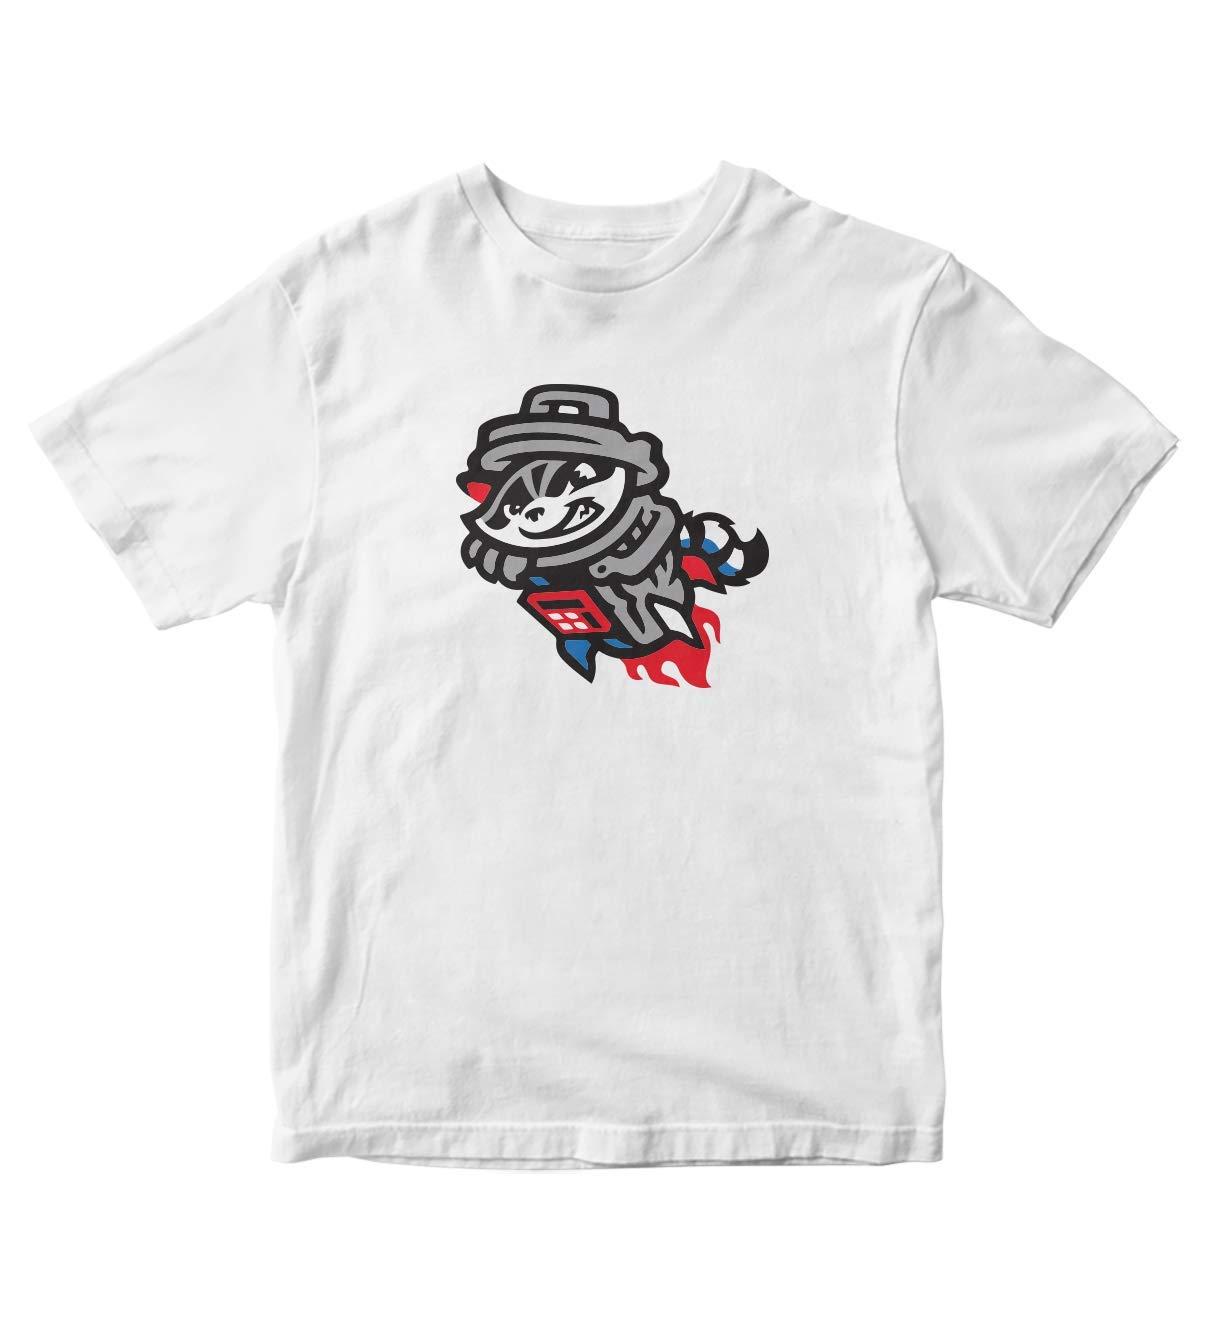 Tjsports Rocket City Trash Pandas Baseball Shirt S Logo 1